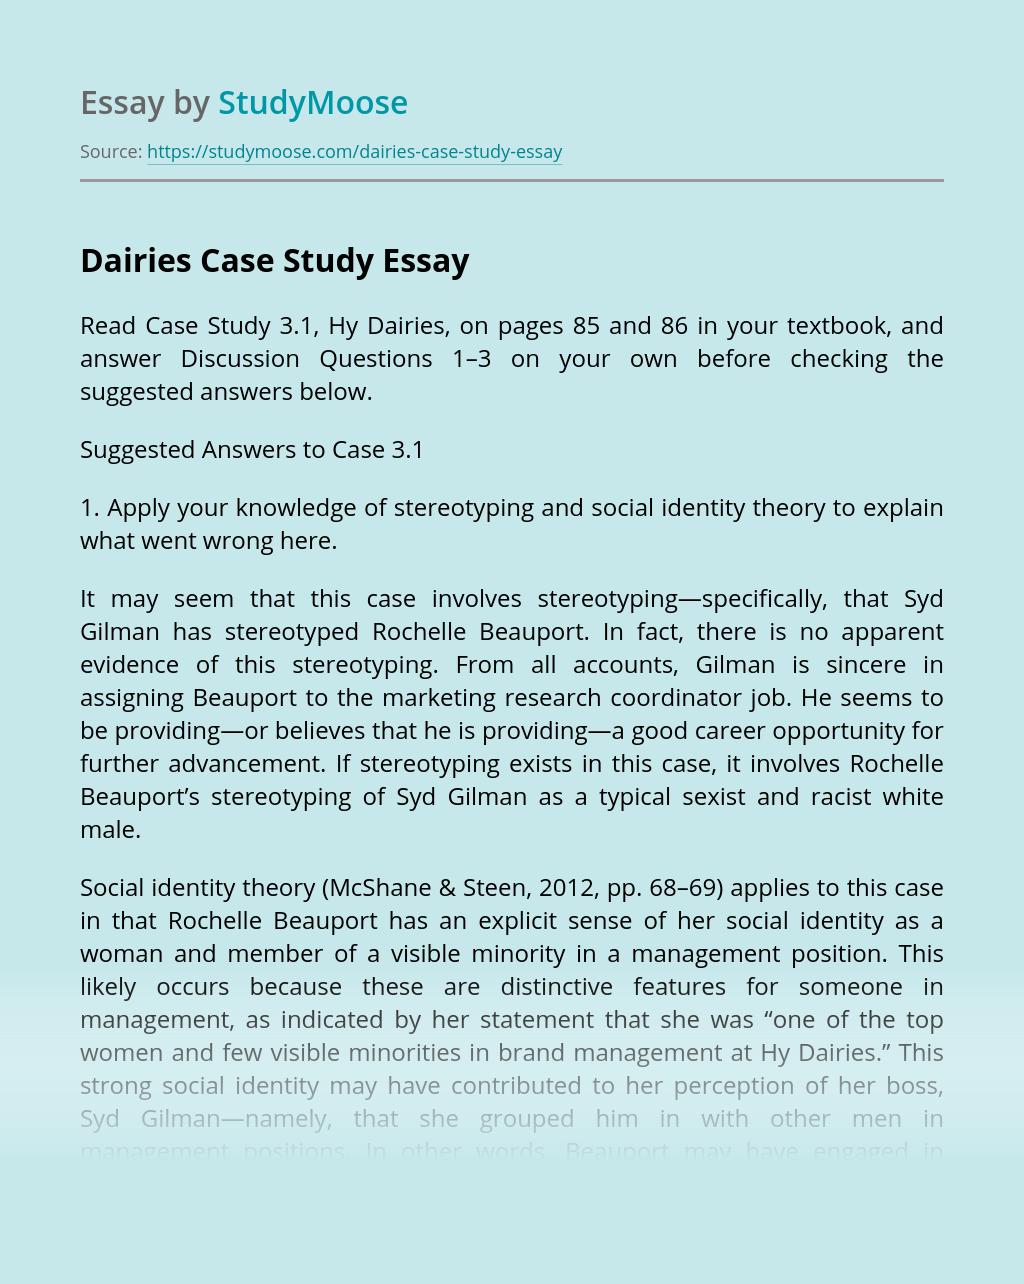 Dairies Case Study